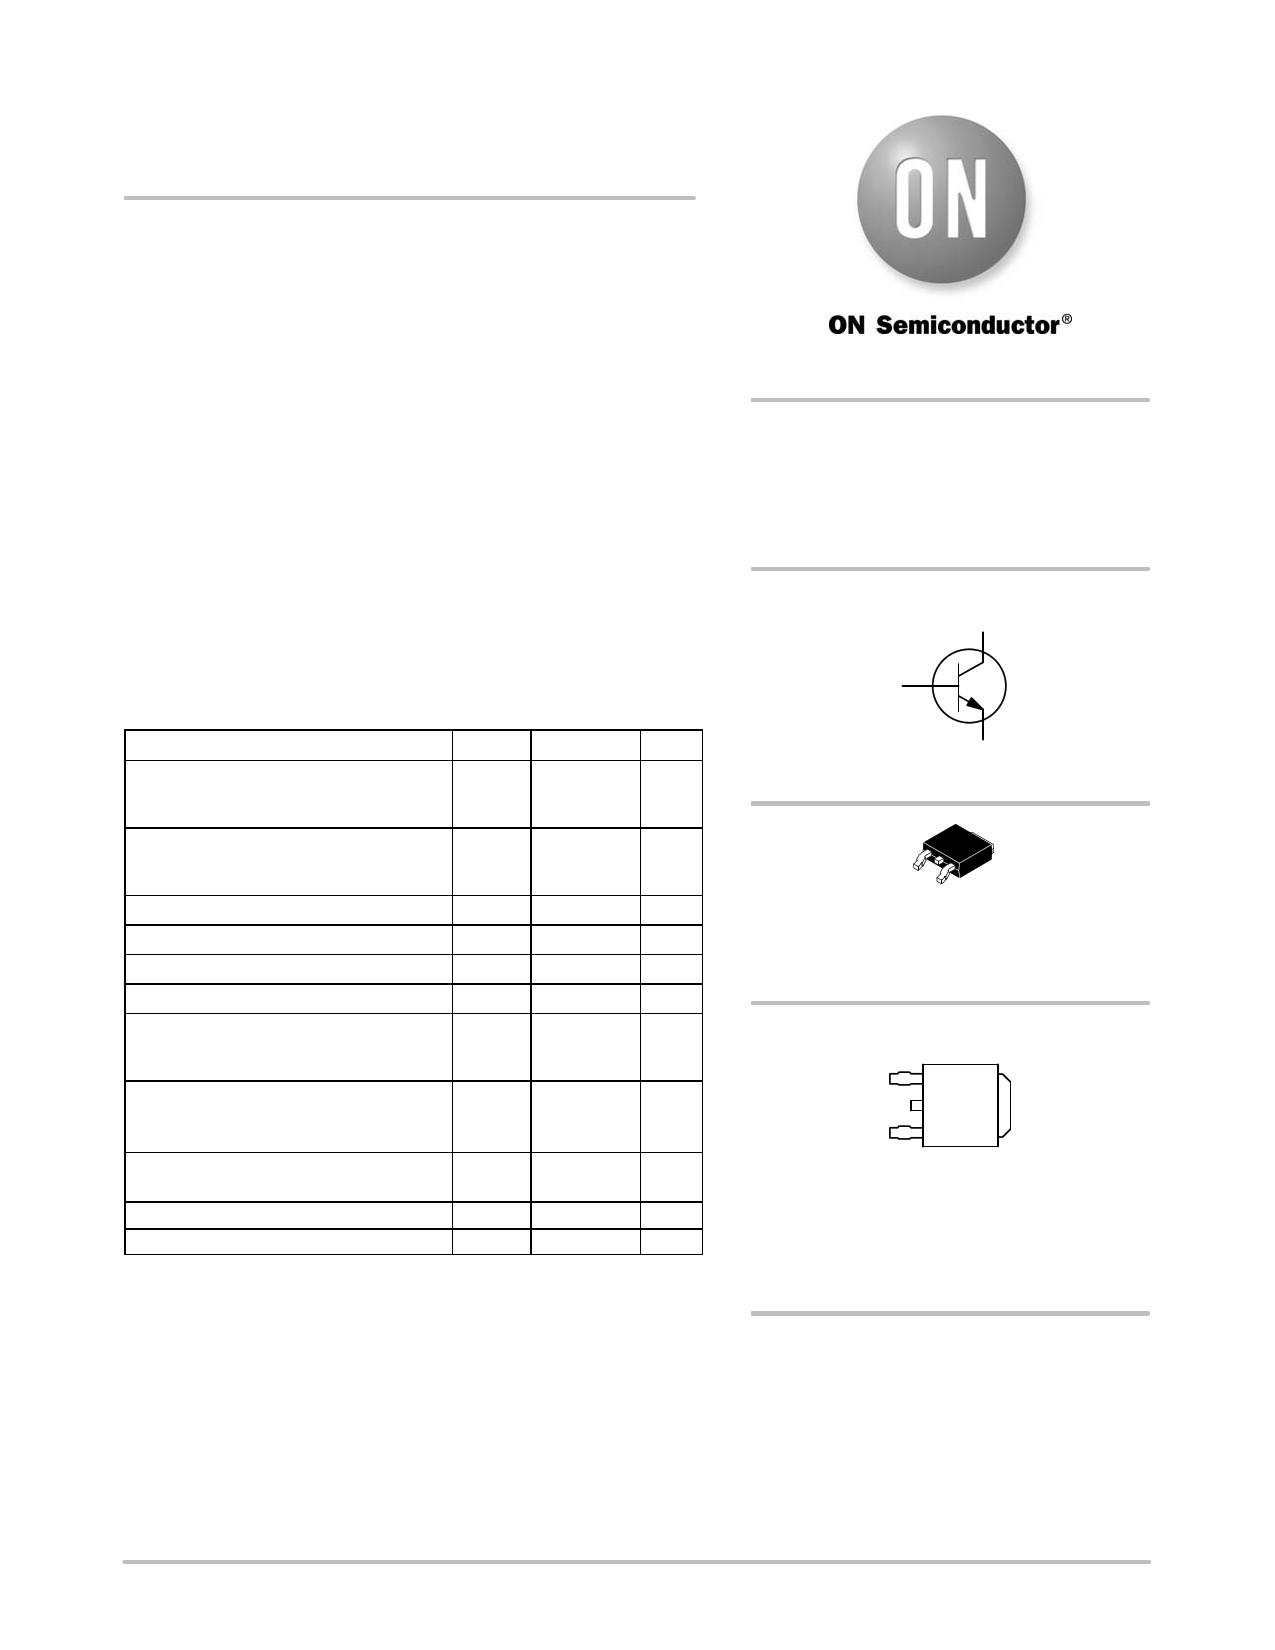 NJVMJD47T4G دیتاشیت PDF